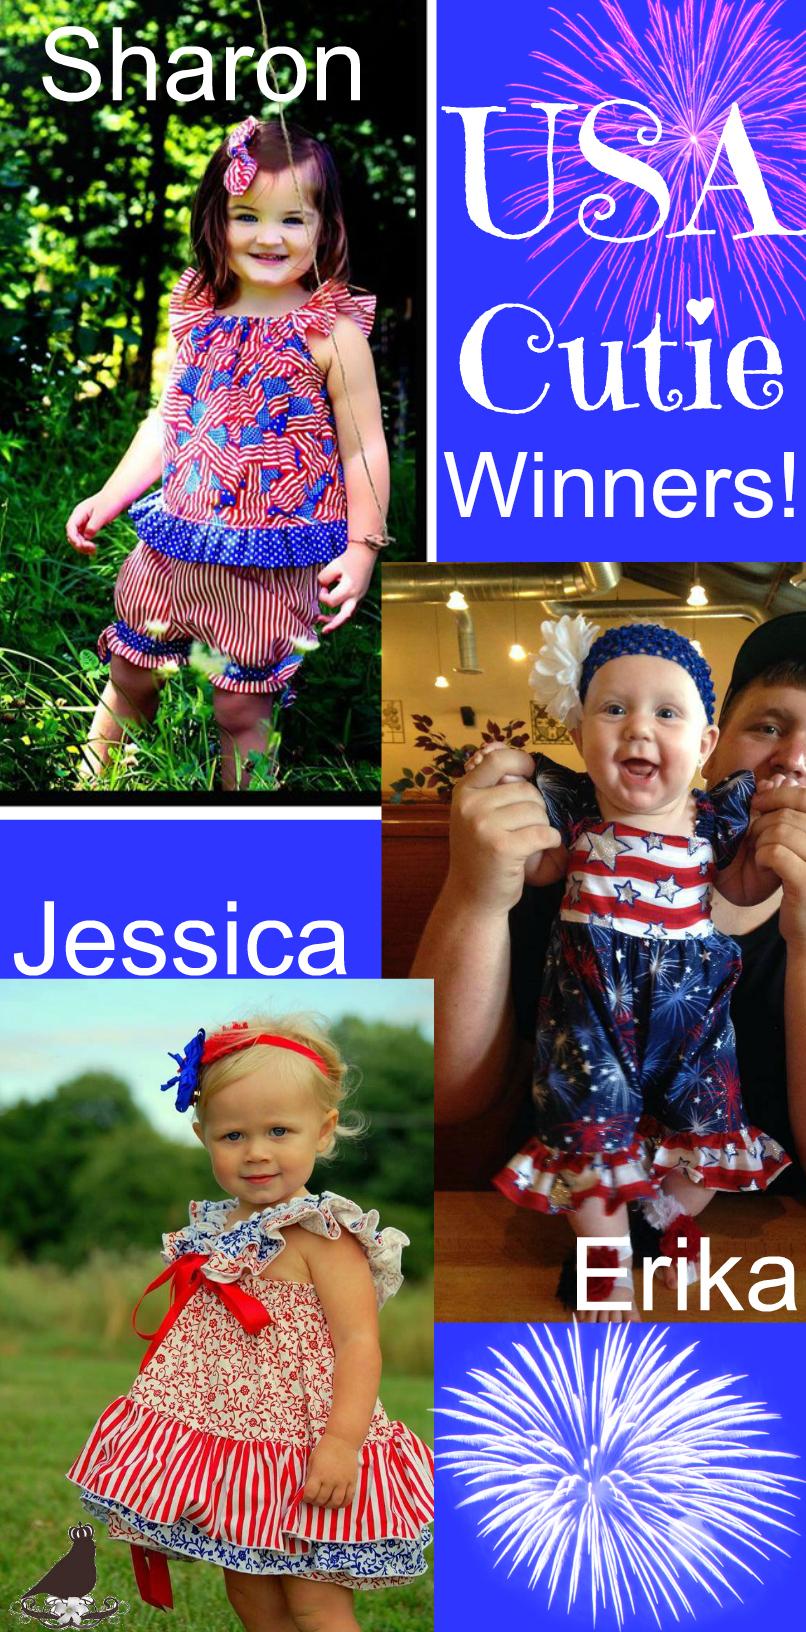 USA Cutie Winners